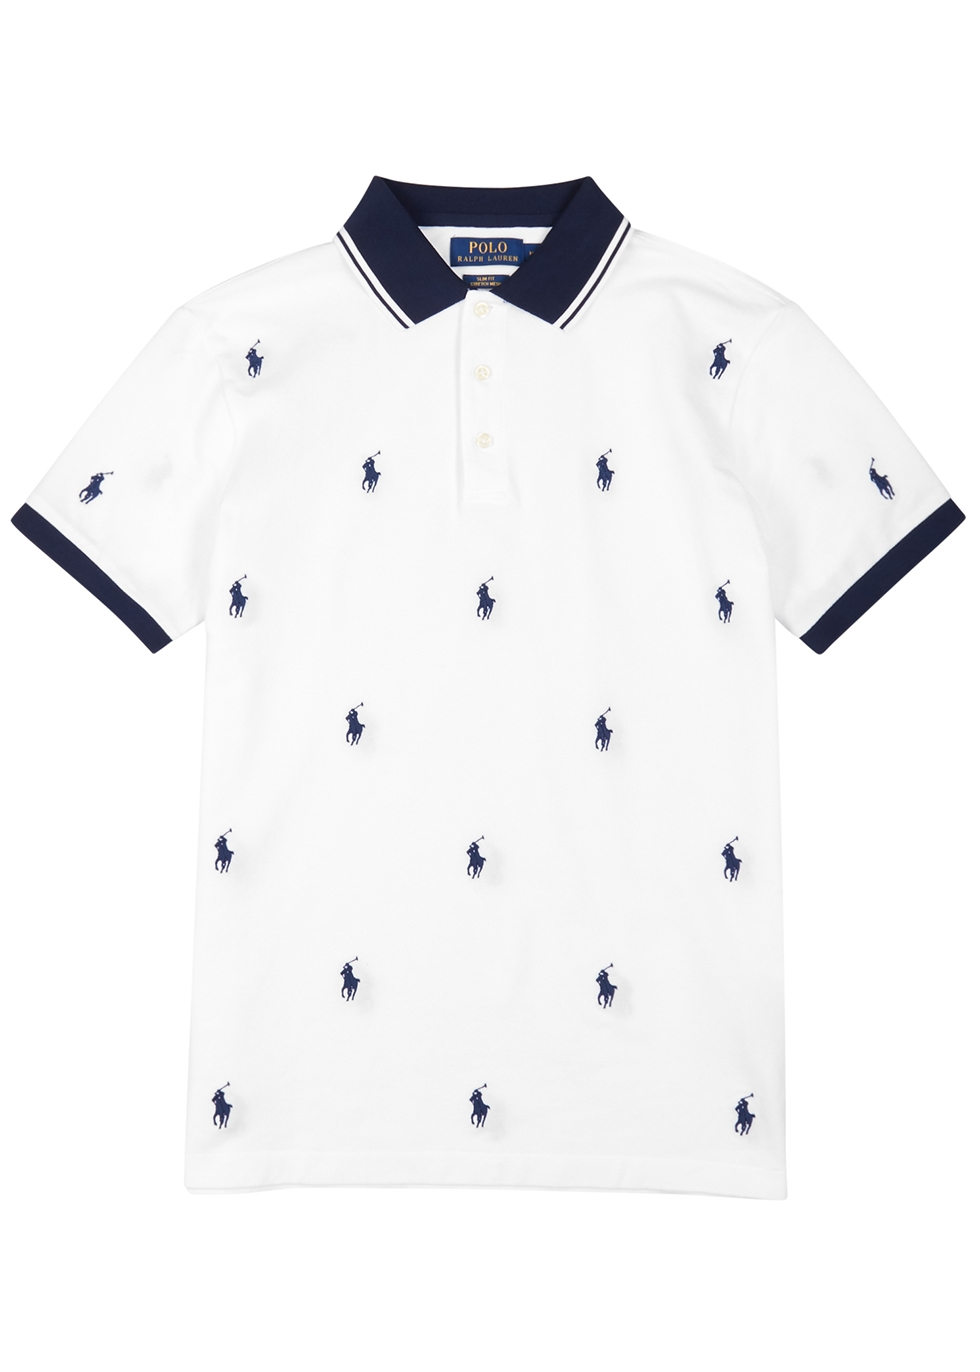 6c423a642b272e Polo Ralph Lauren Polo Shirts